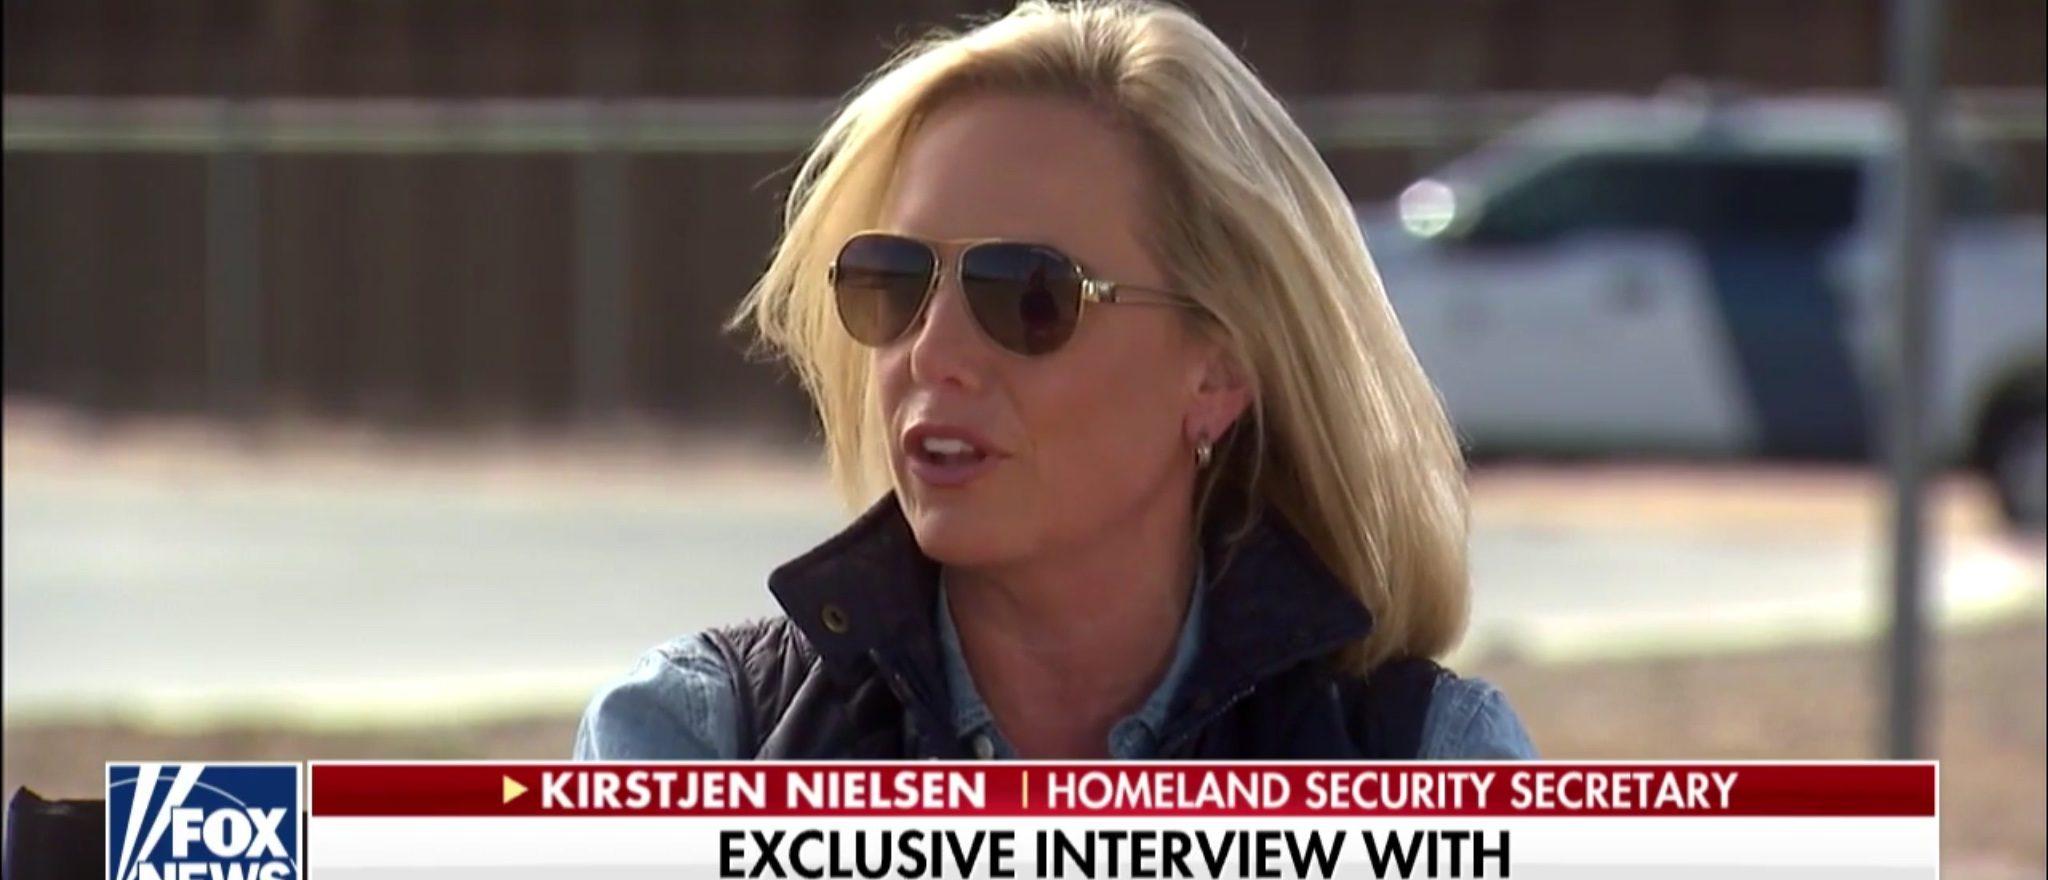 Department of Homeland Security Secretary Kirstjen Nielsen speaks with Fox News on Thursday, Oct. 26, 2018. (Photo: Screenshot/Fox News)